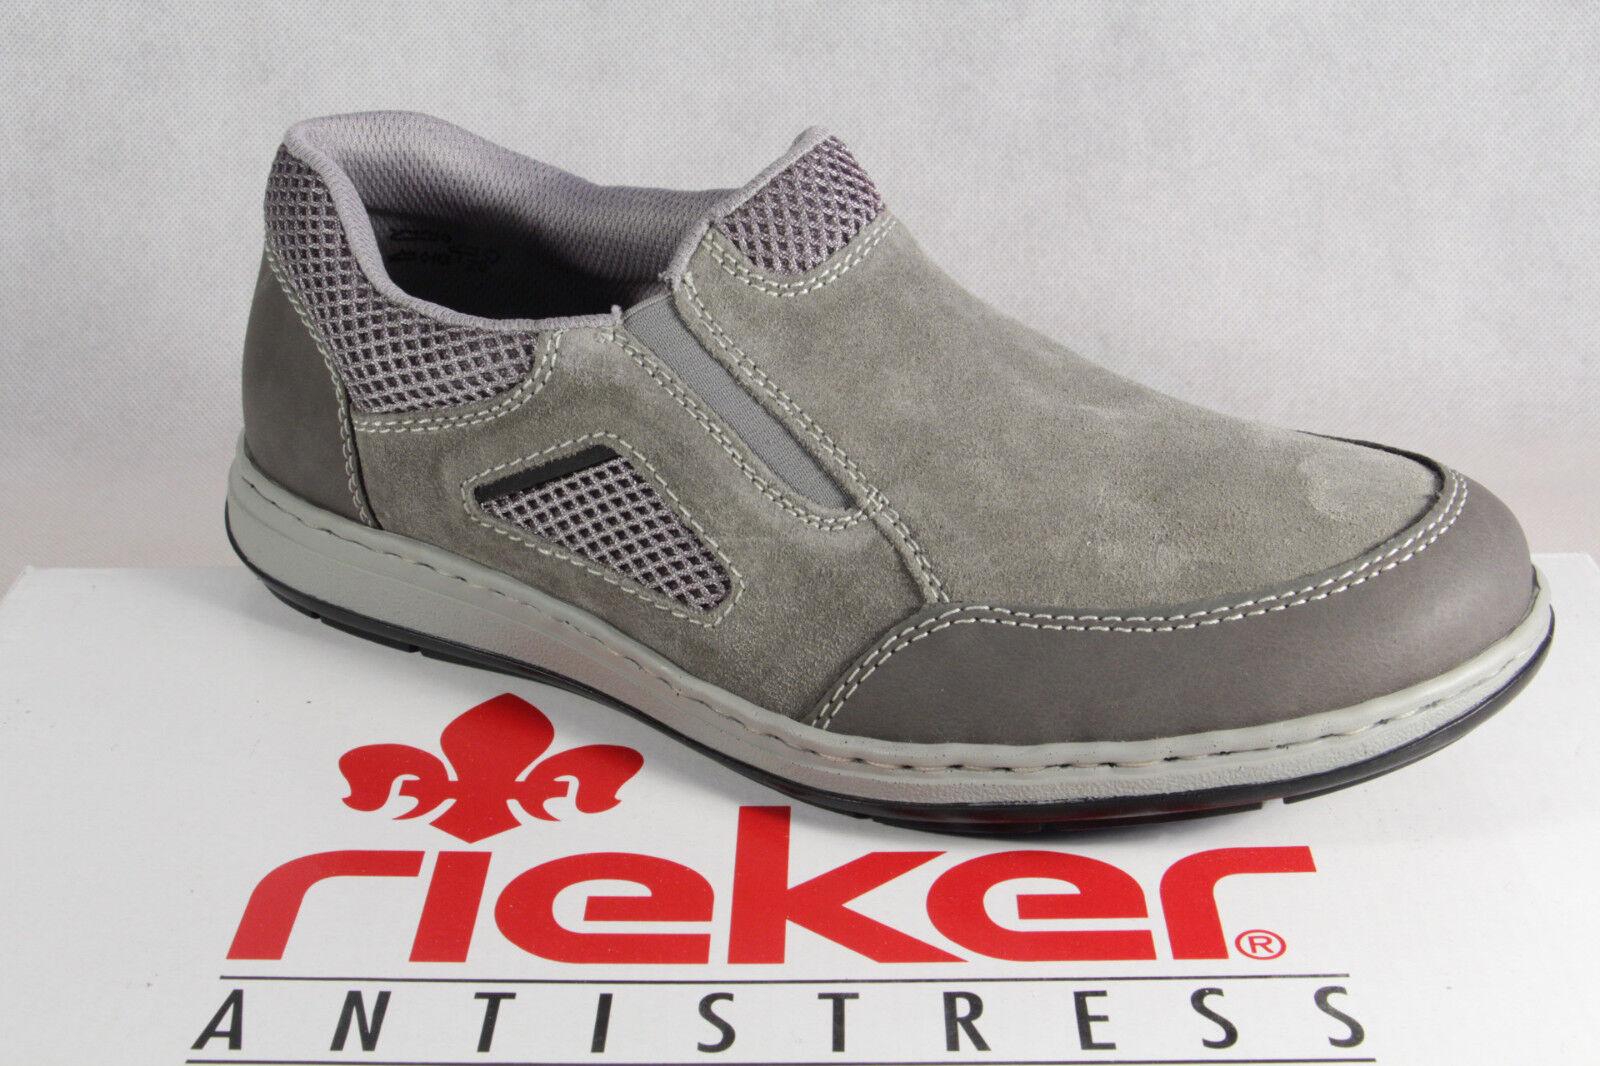 Extra Weit Chaussures HalbChaussuresRieker SchnürChaussuresSlipper de Tennis K3F1JcTl